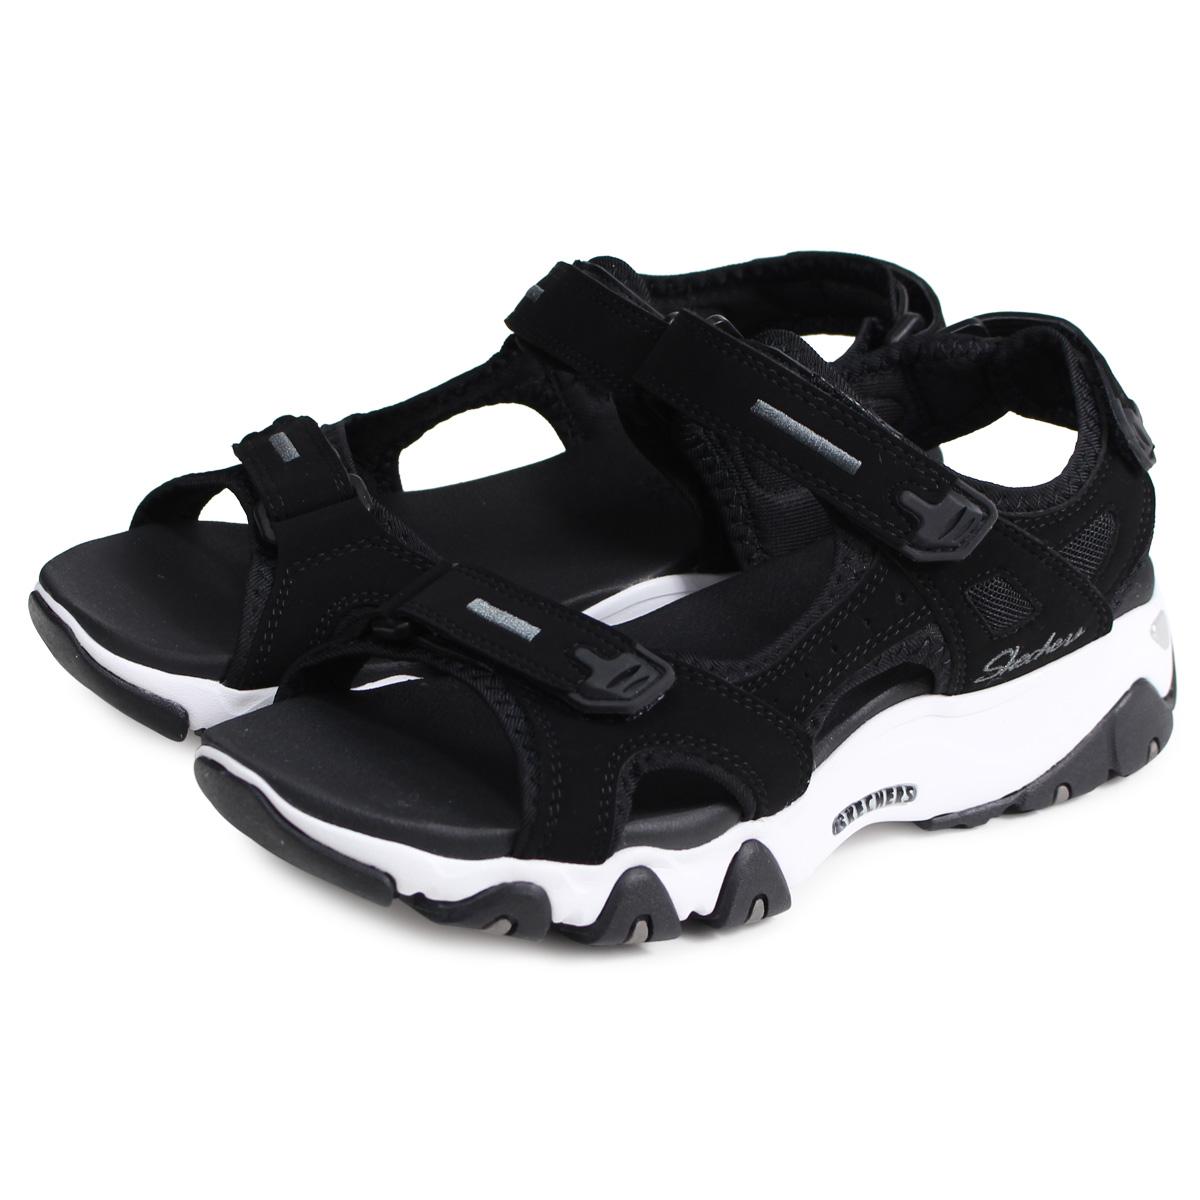 Escrupuloso espacio Pack para poner  SKECHERS DLITES 2.0 KILOWATT Skechers Delight 2.0 sandaler sportsandaler  Dames herre svart svart 32999